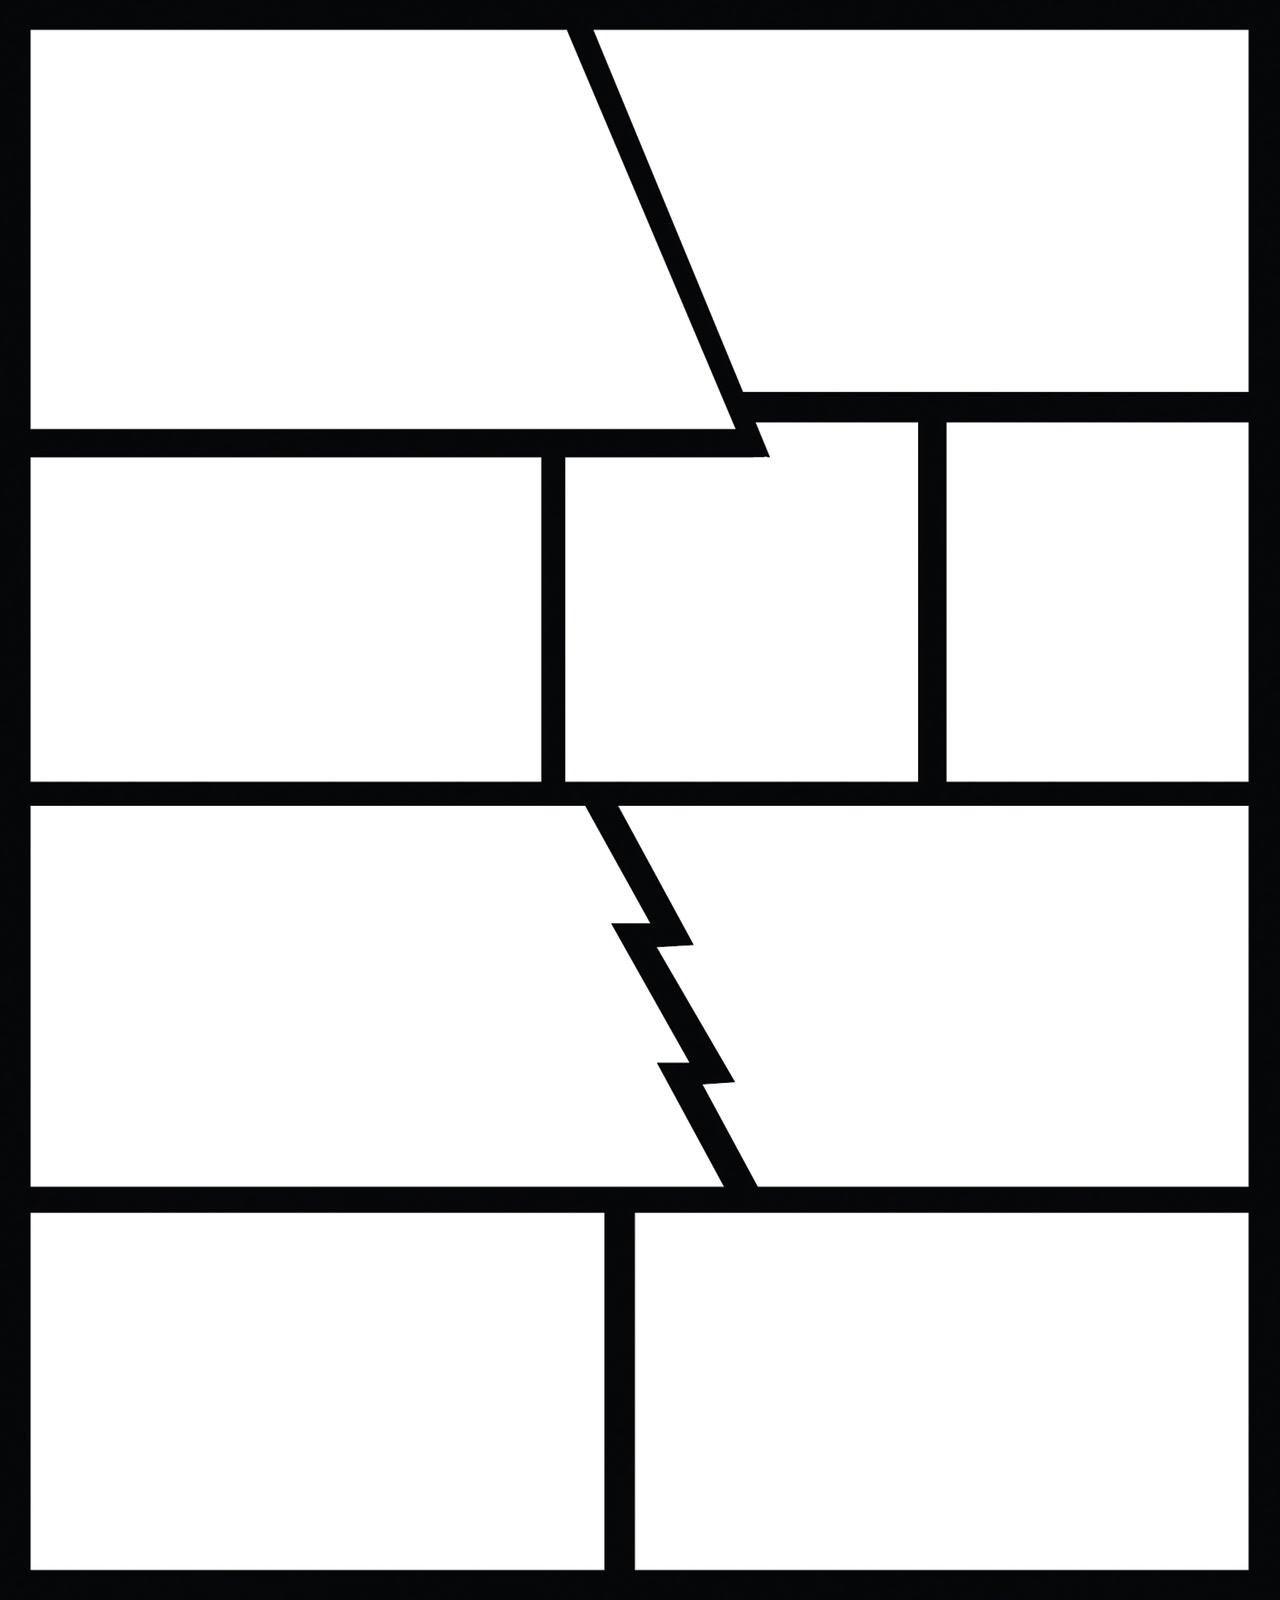 comic strip templates blankic book panels templates continue